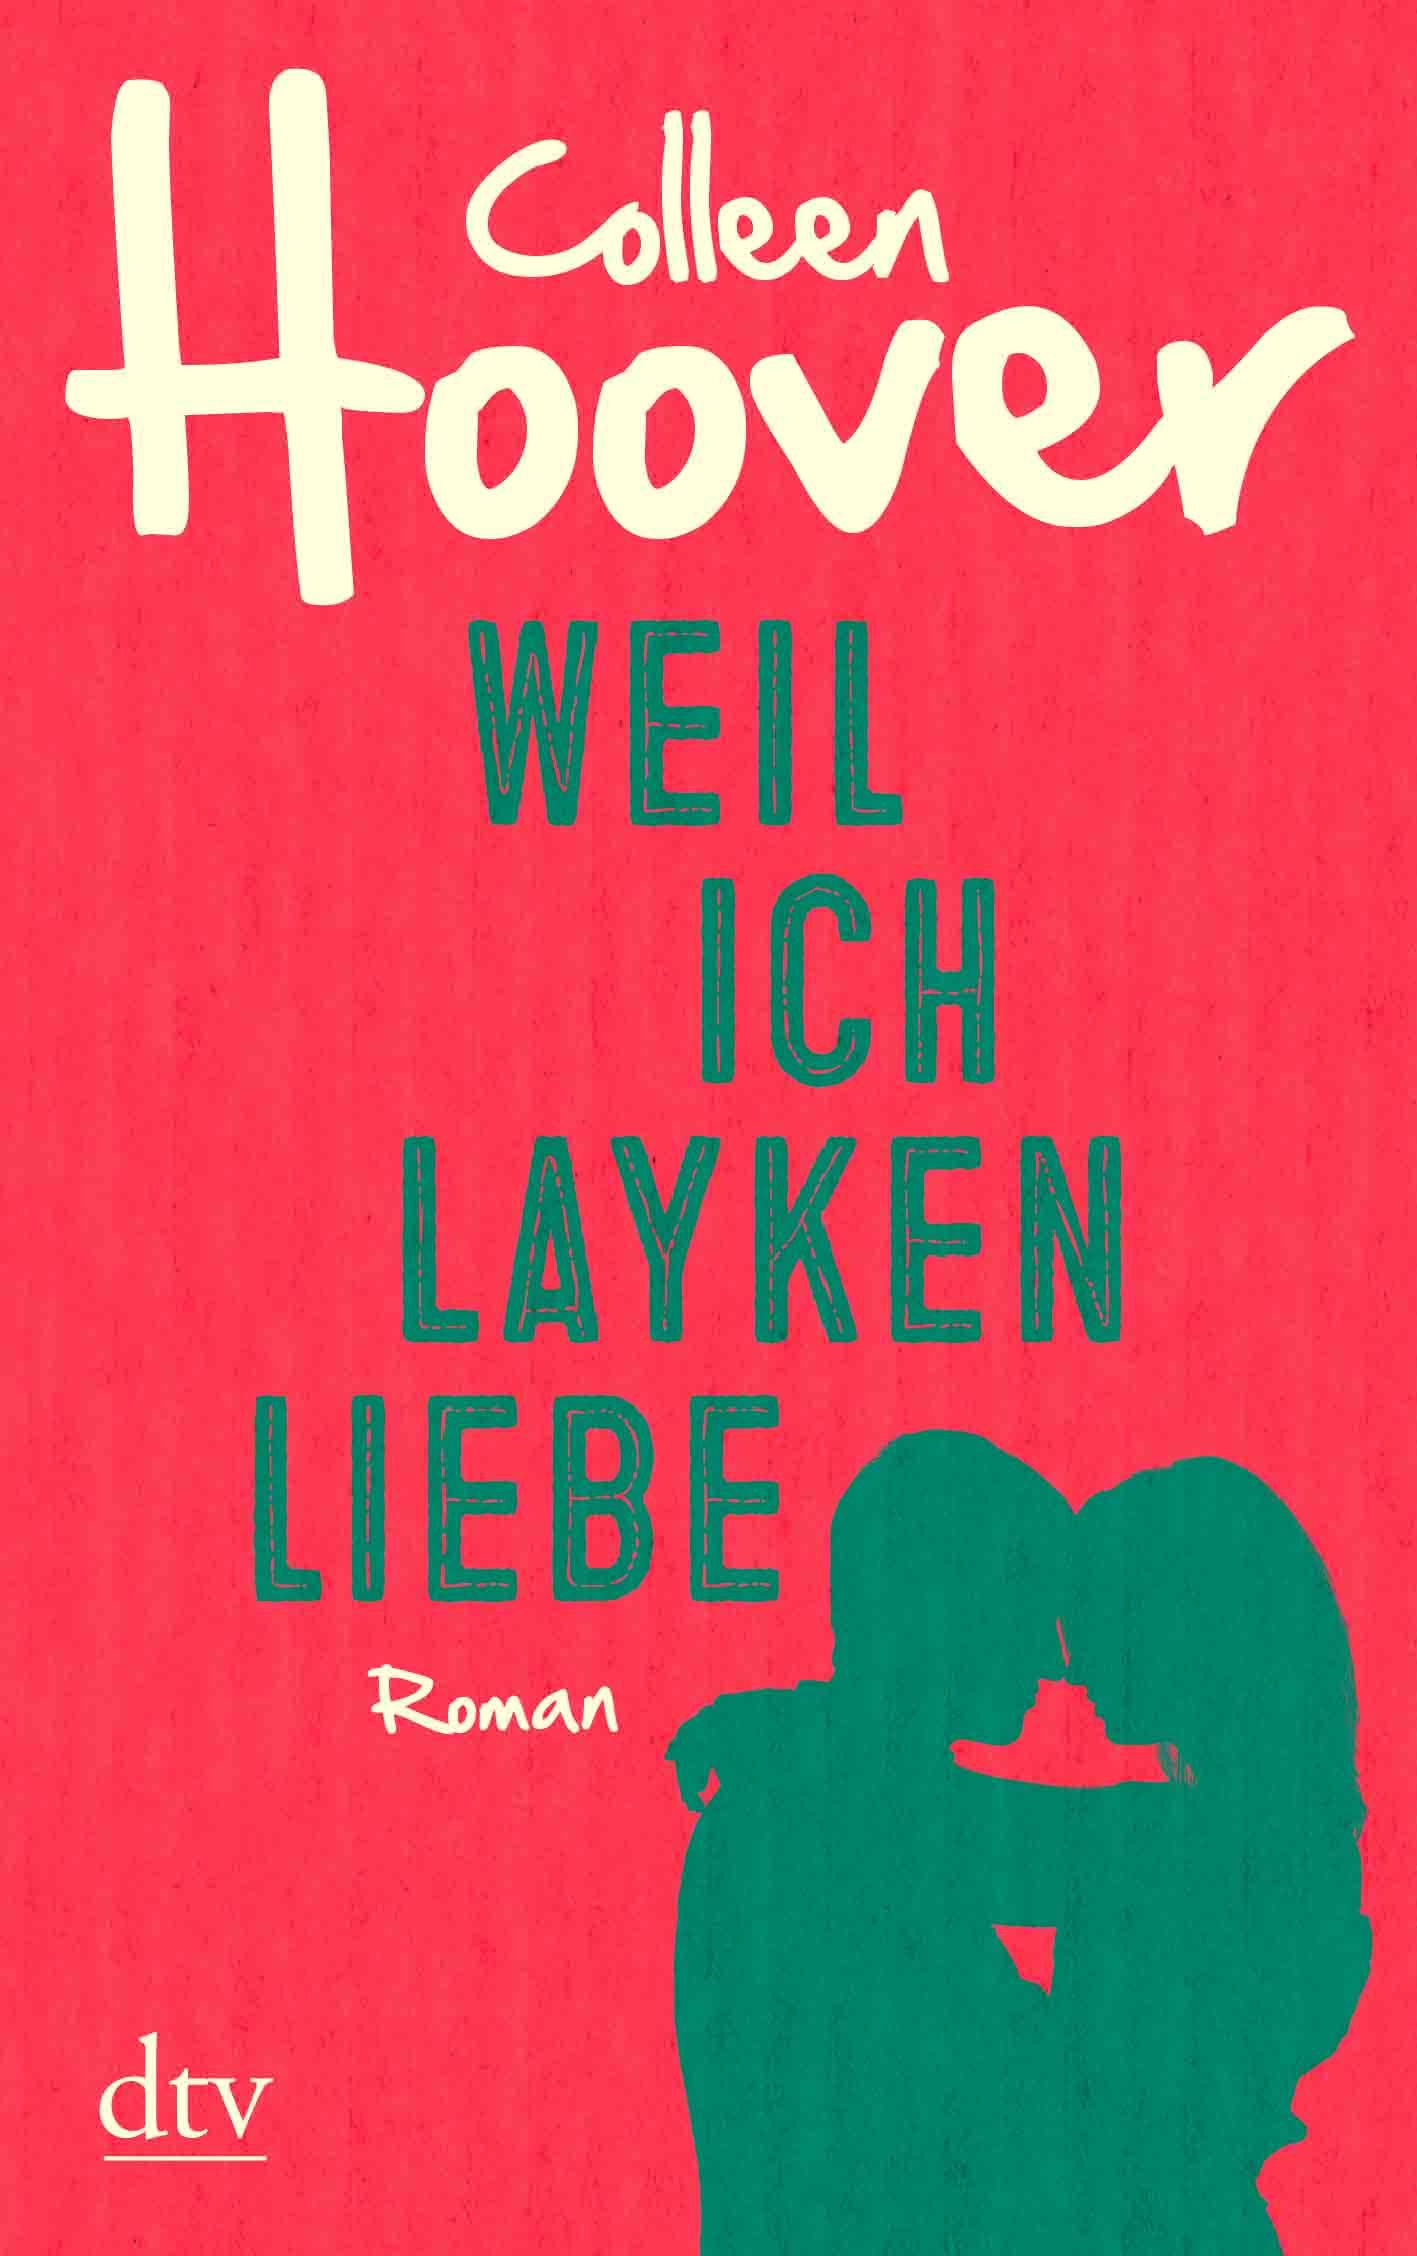 Weil-ich-Layken-liebe-Colleen-Hoover-dtv-CoverNEU